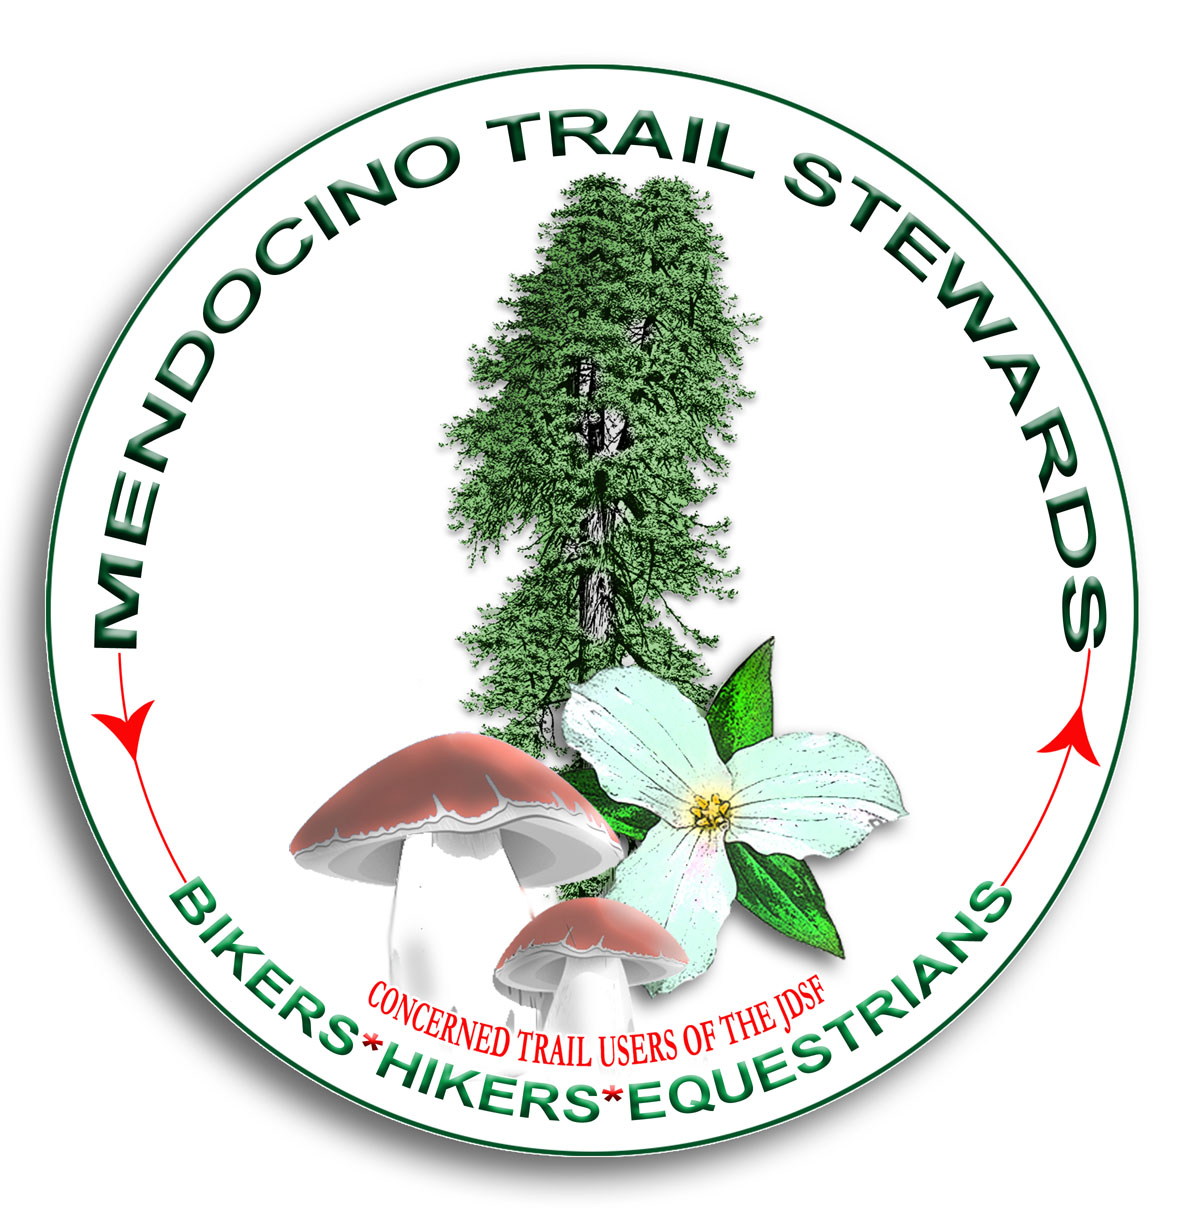 mendocino trail stewards logo